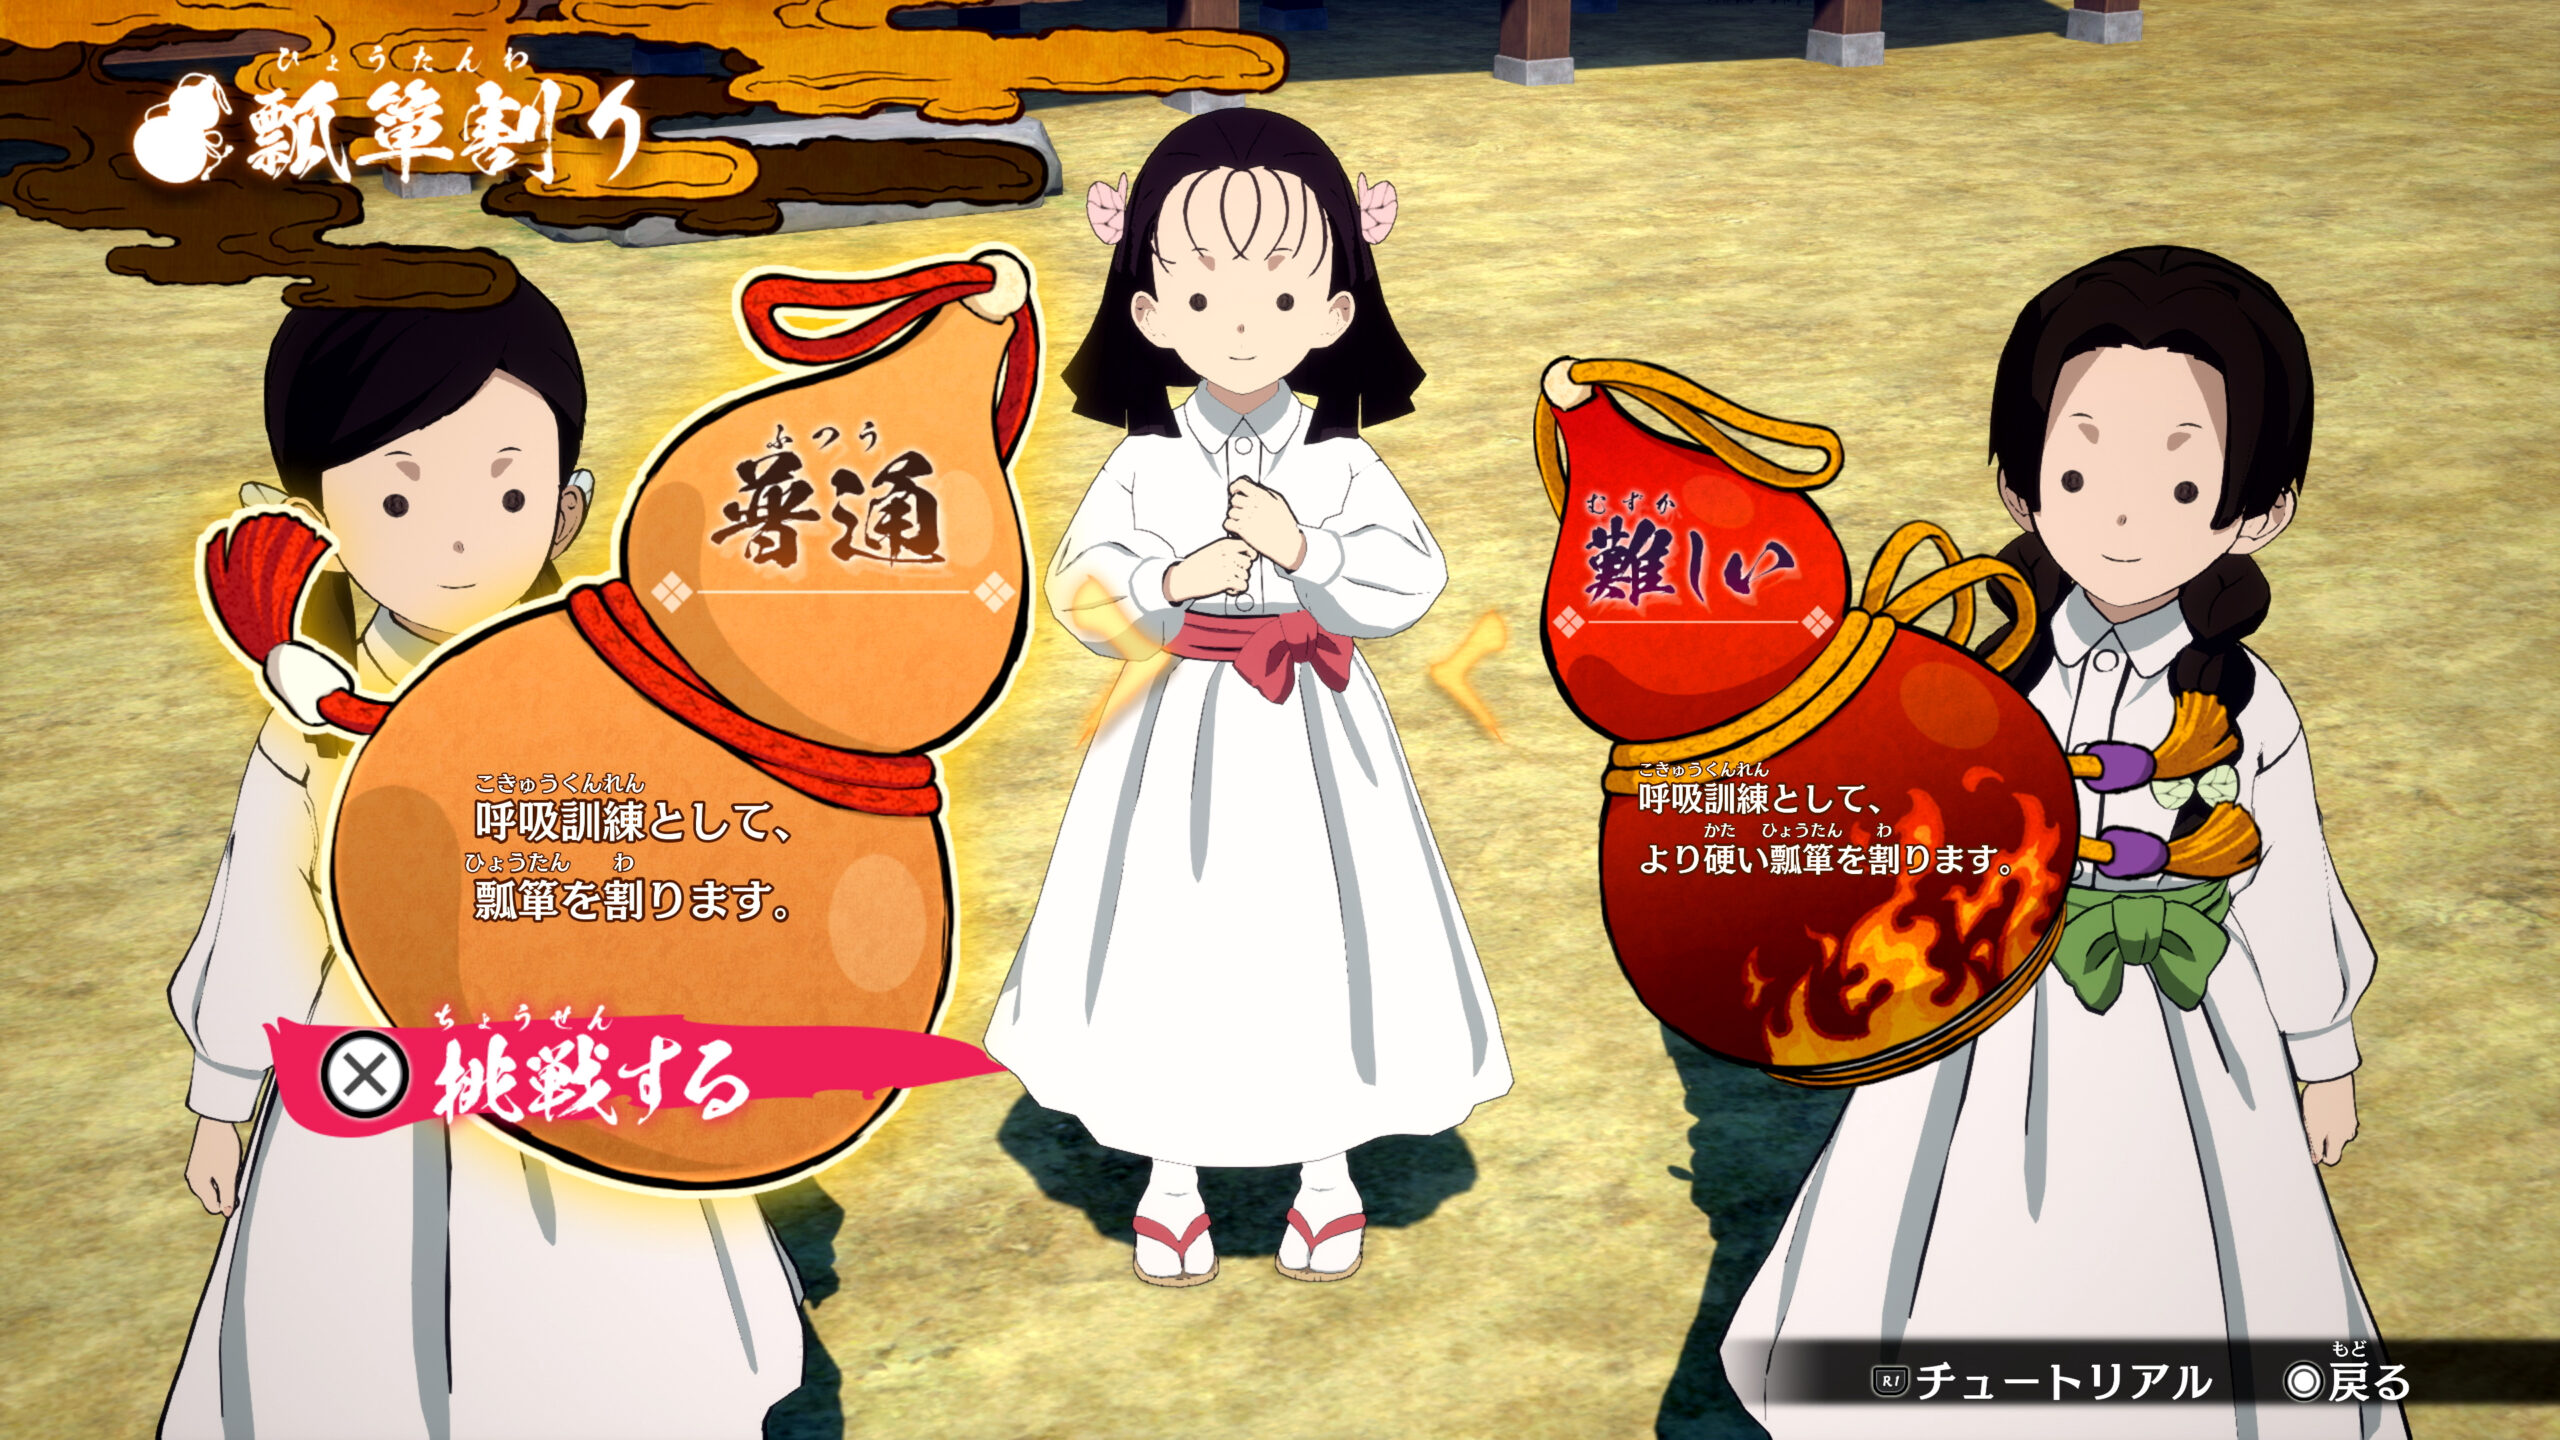 Demon Slayer Kimetsu no Yaiba The Hinokami Chronicles 2021 09 10 21 006 scaled